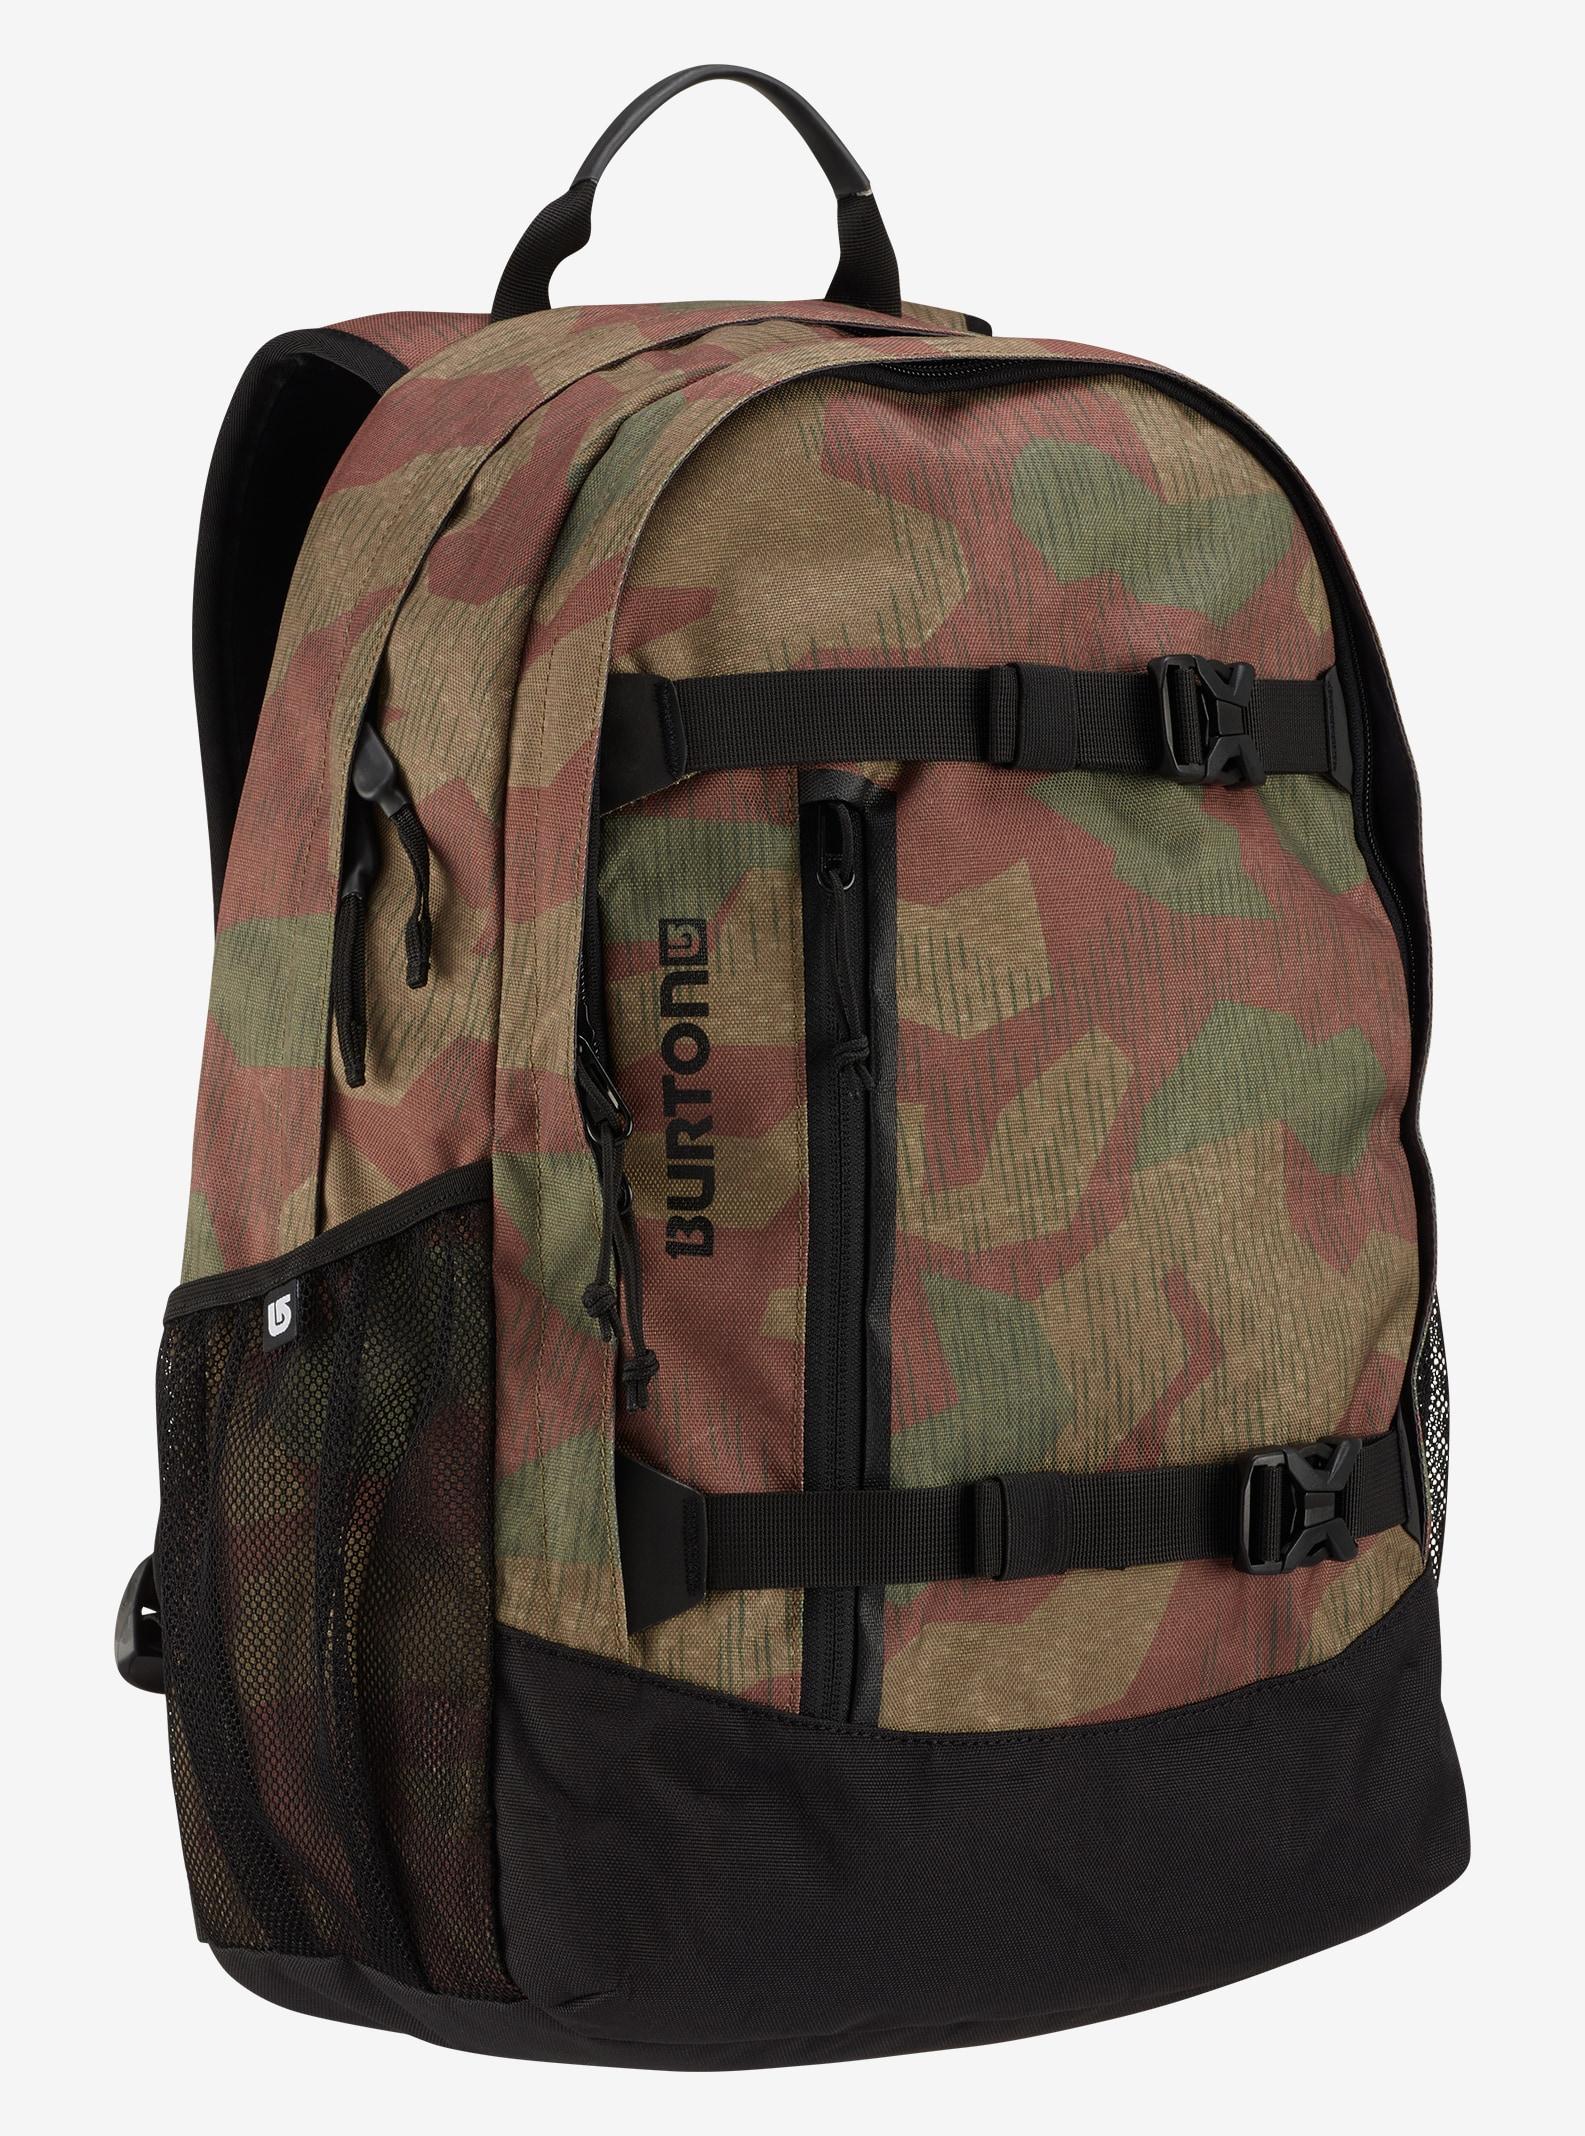 Burton Day Hiker 25L Backpack shown in Splinter Camo Print